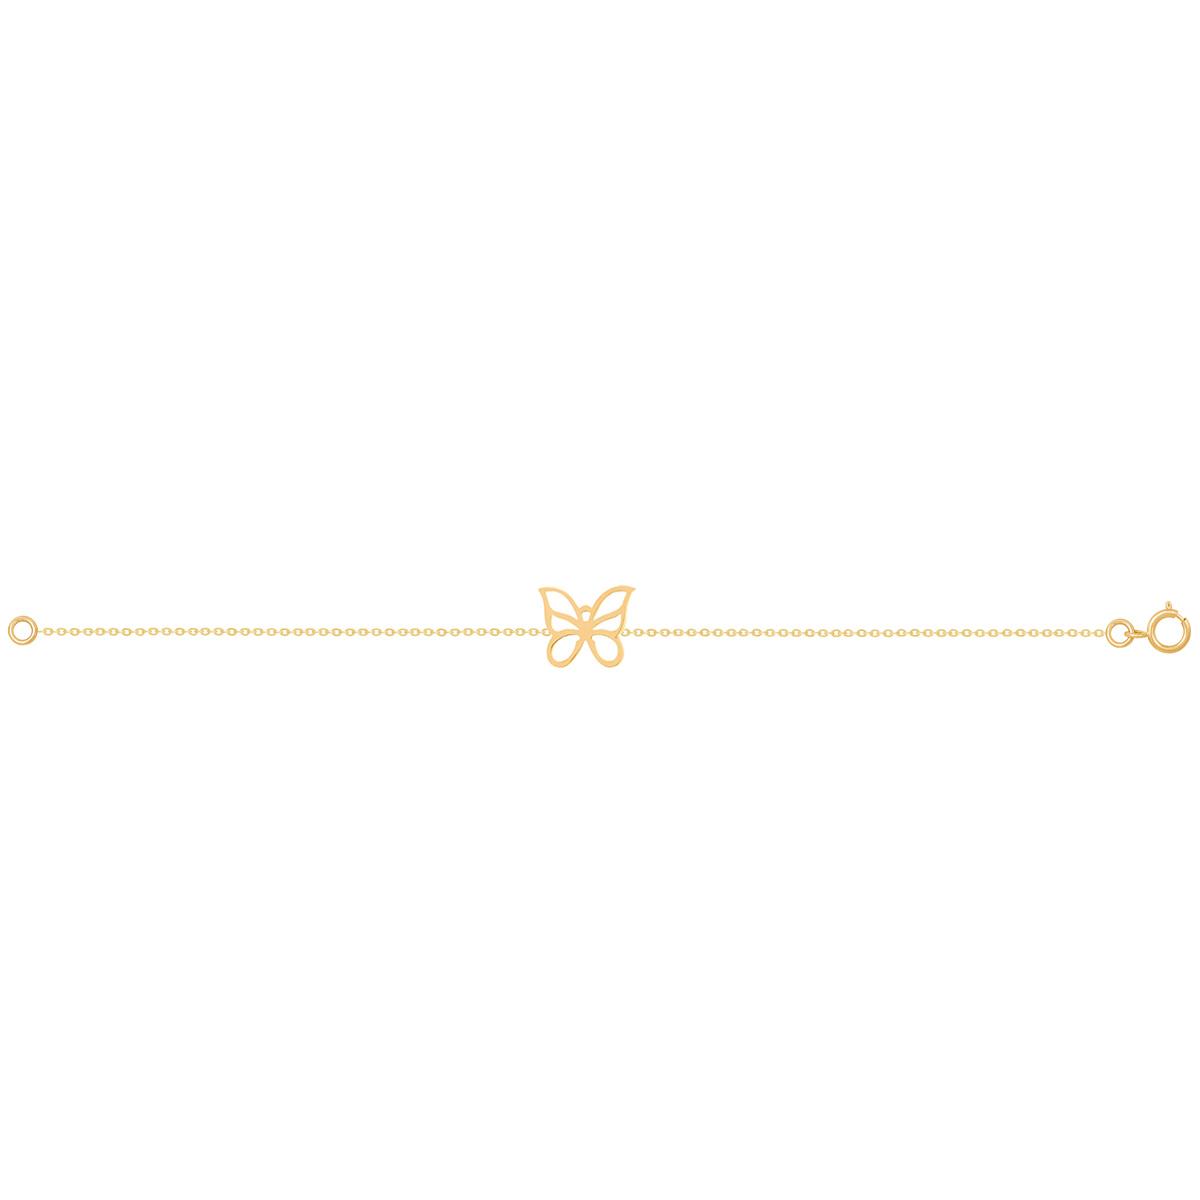 دستبند طلا پروانه پرسته